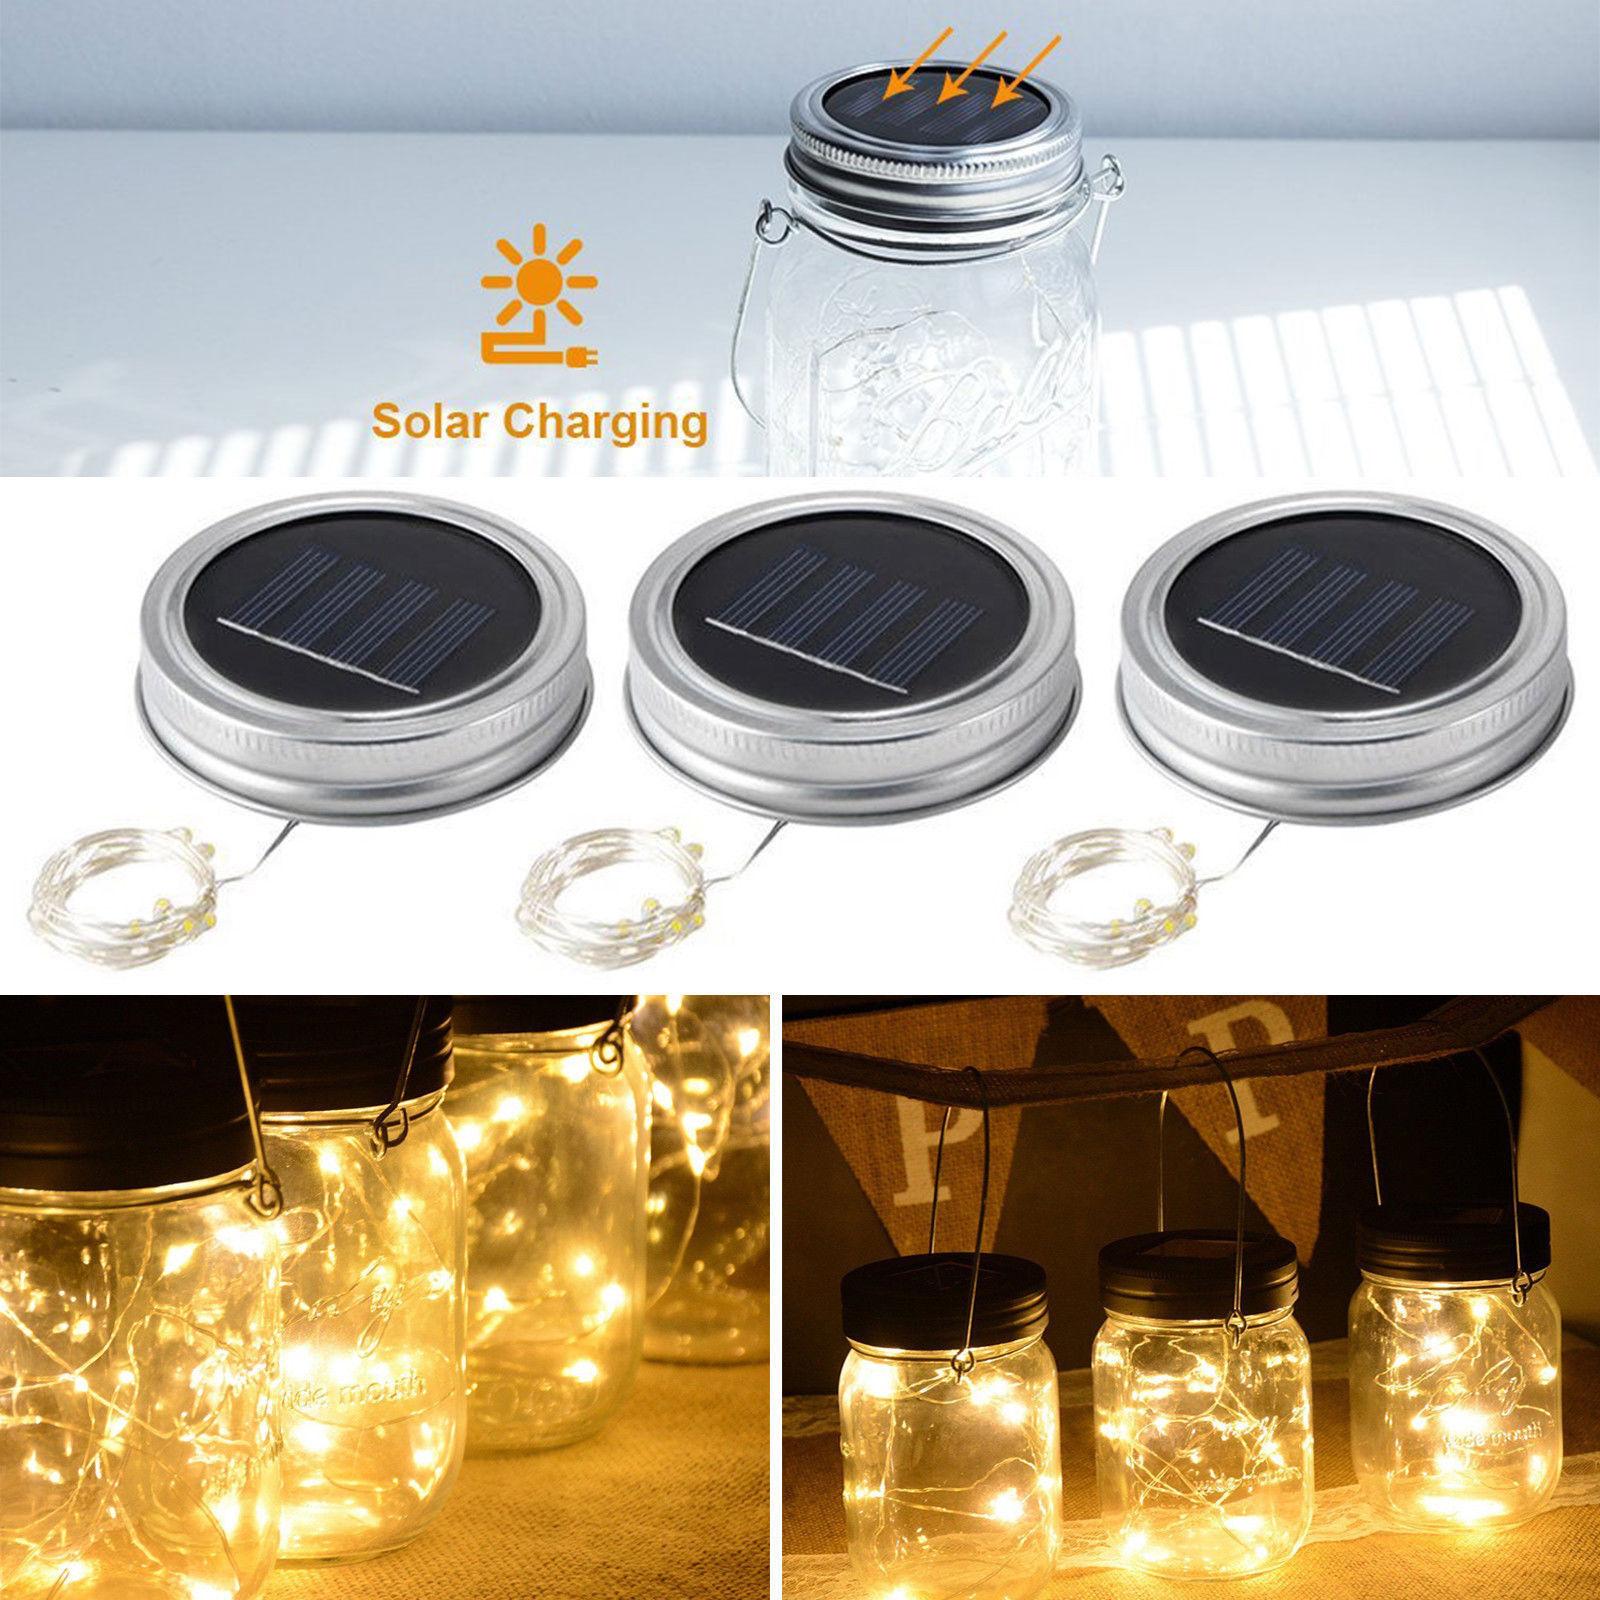 UK 20 LED String Fairy Light Solar Jar Lid Bottle Cap Light Xmas Decor 2M